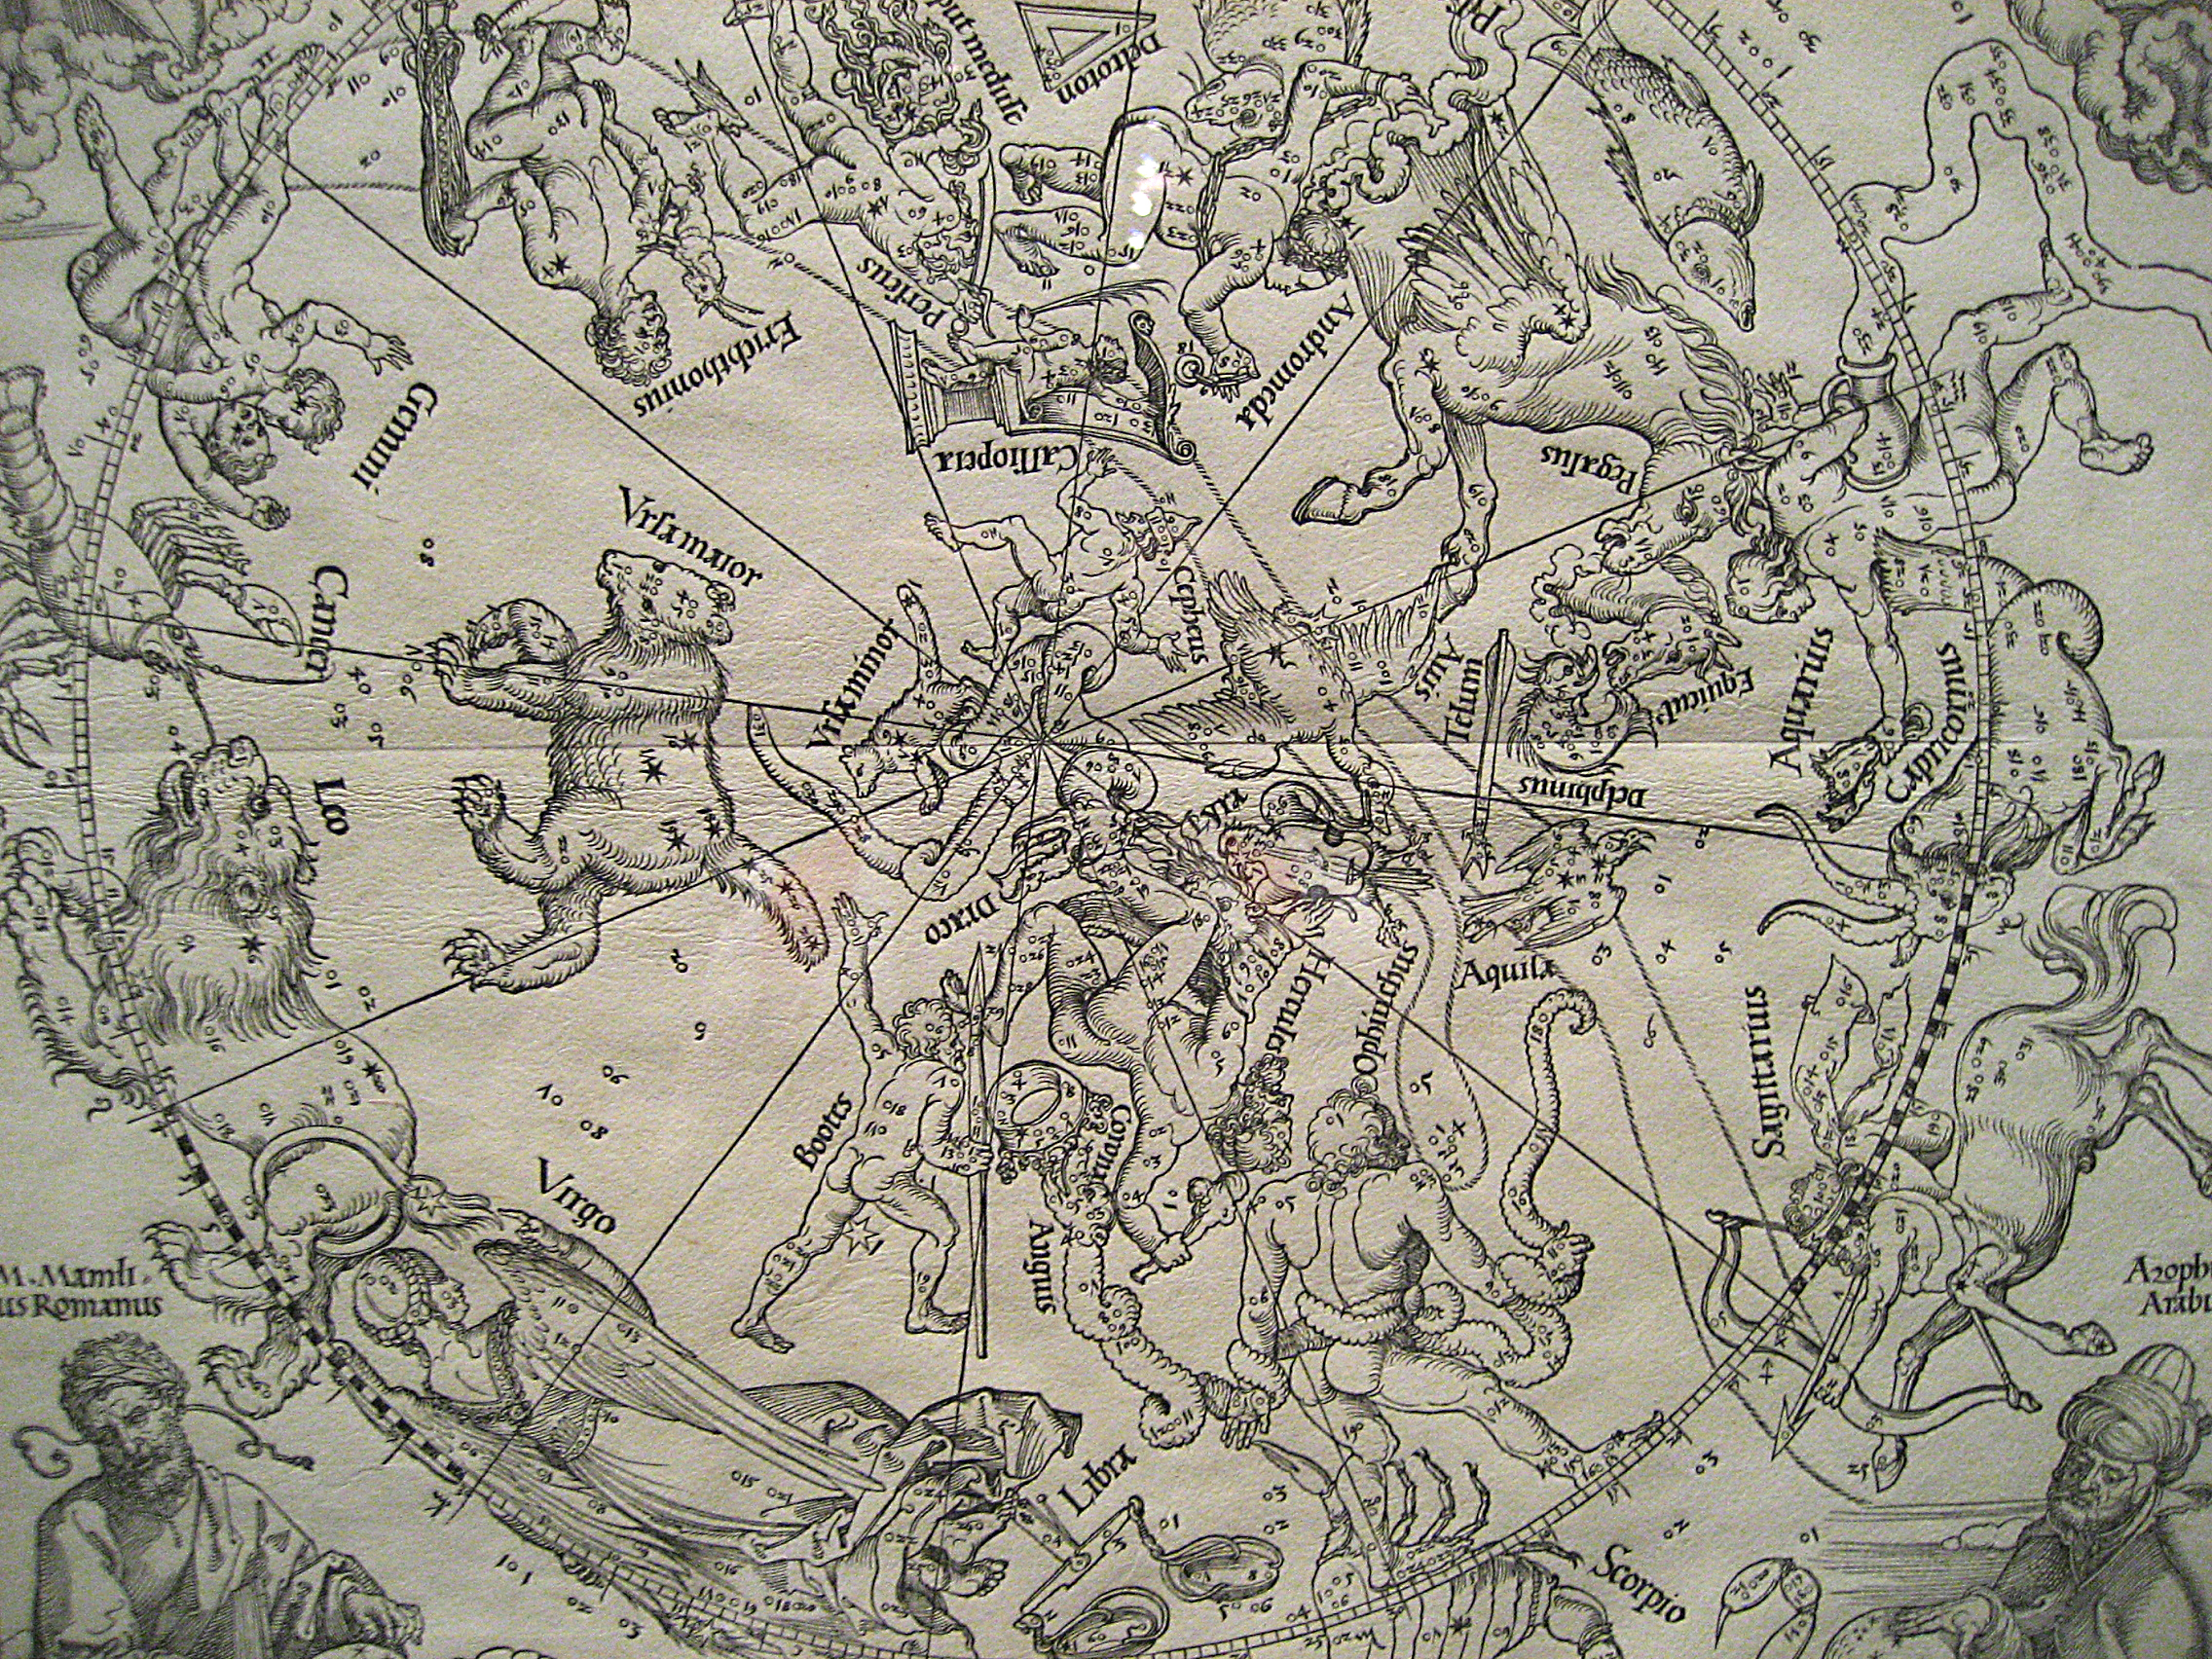 Celestial_Map_of_the_Northern_Sky_1515_MET_NYC dans SAGESSE des PLEIADES